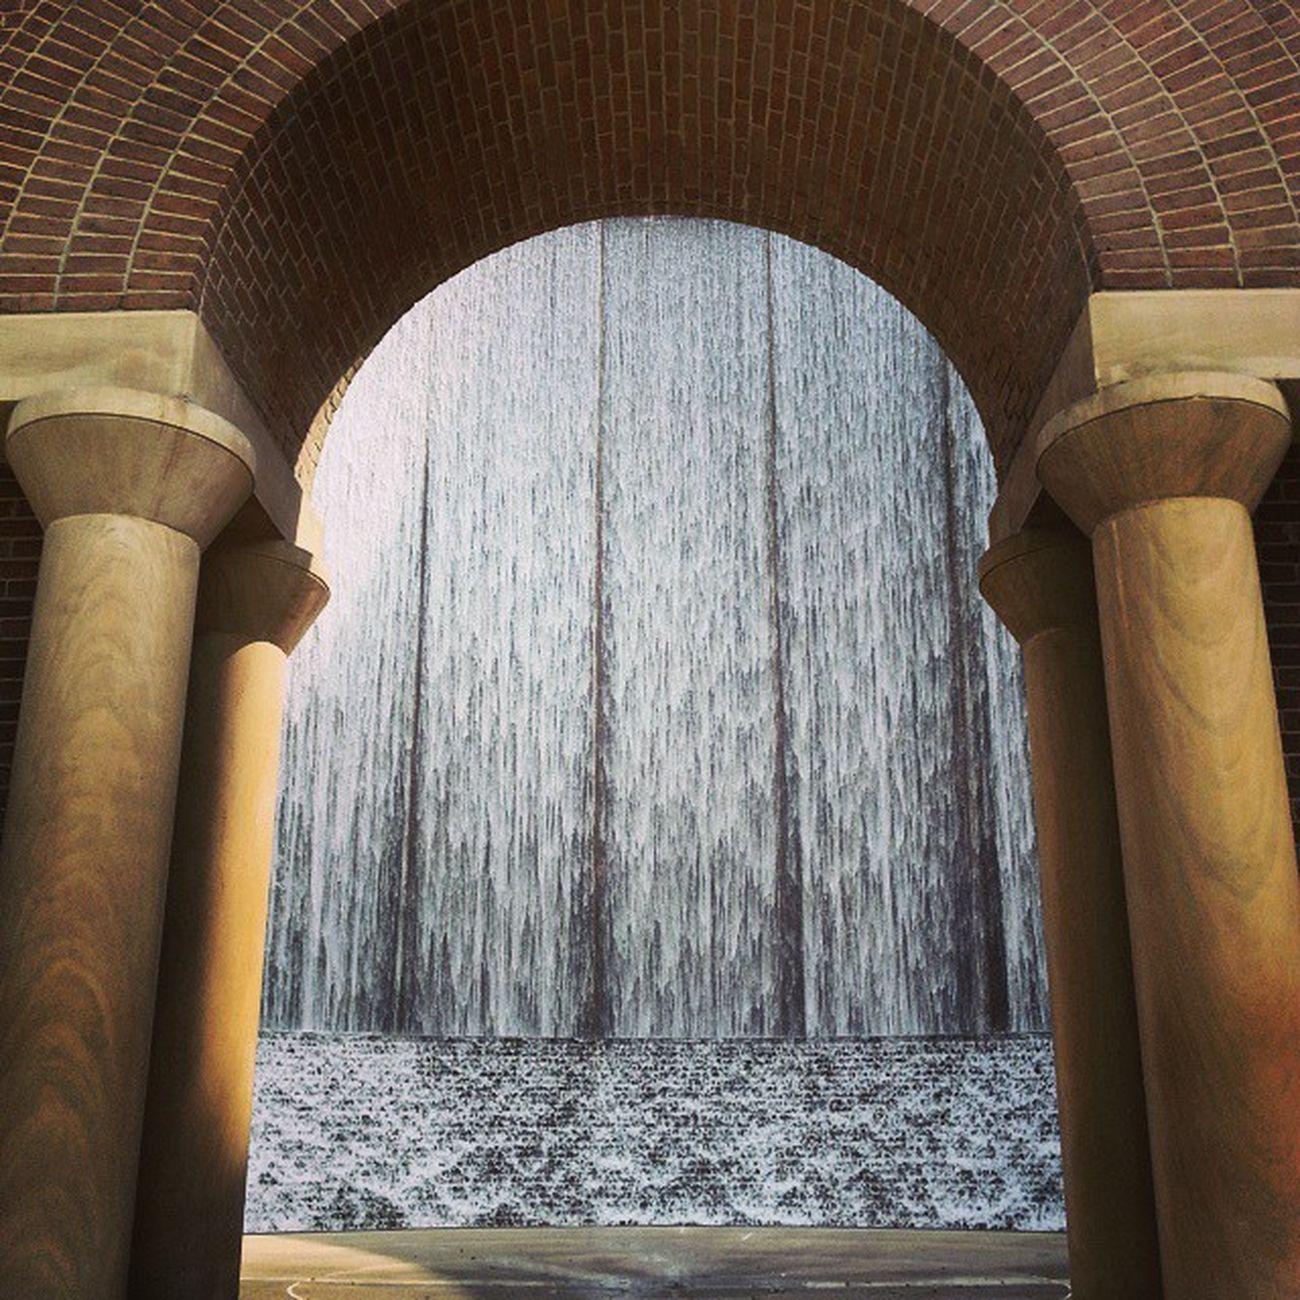 Geralddhineswaterwallpark Houston Galleria Architecture Texas